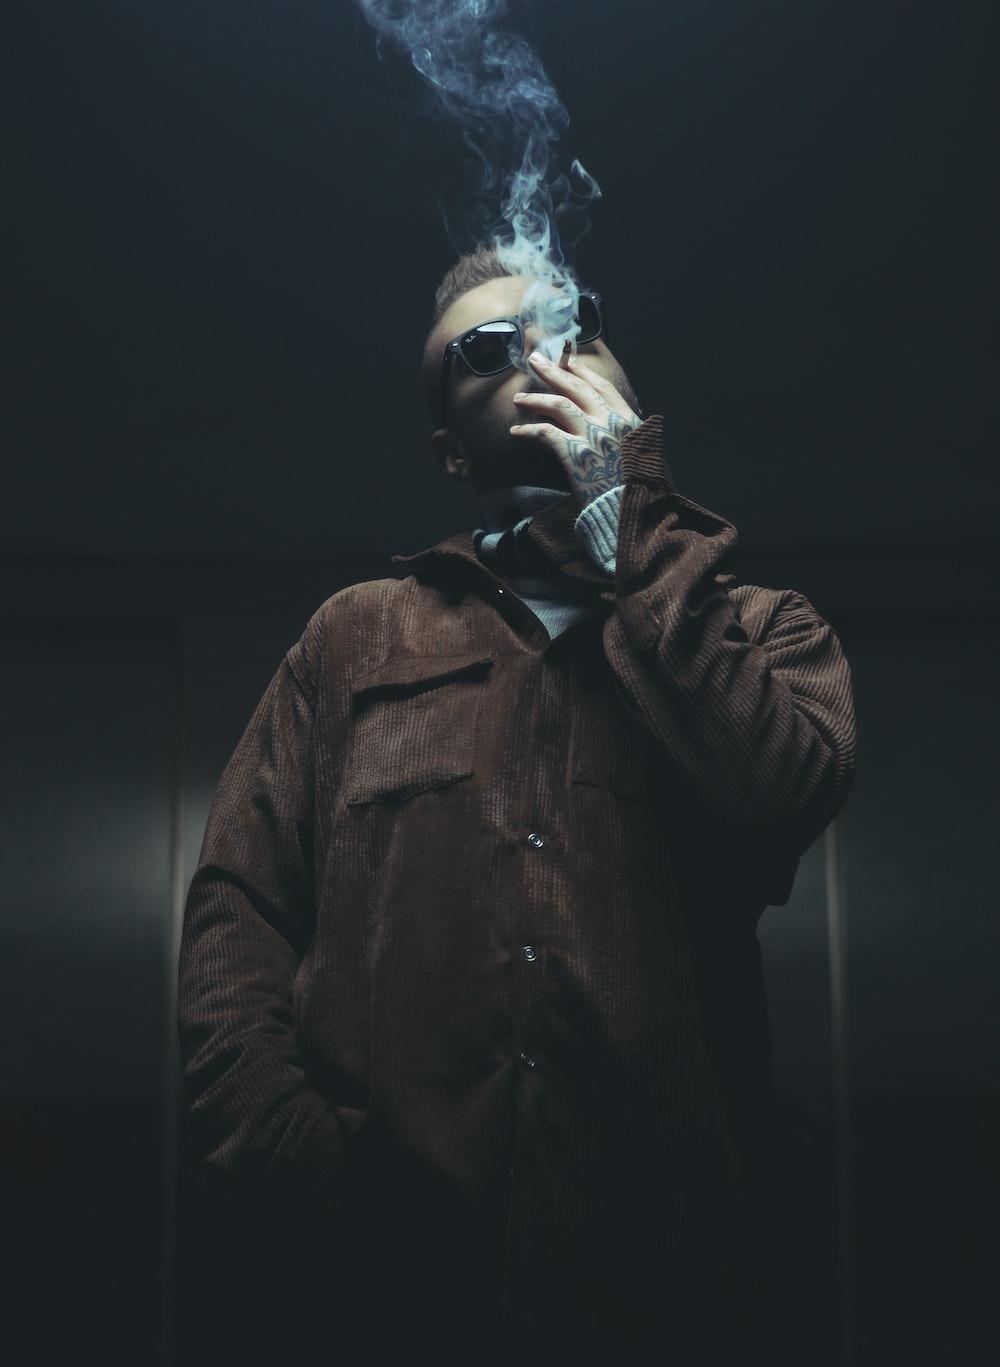 man in brown leather jacket smoking cigarette